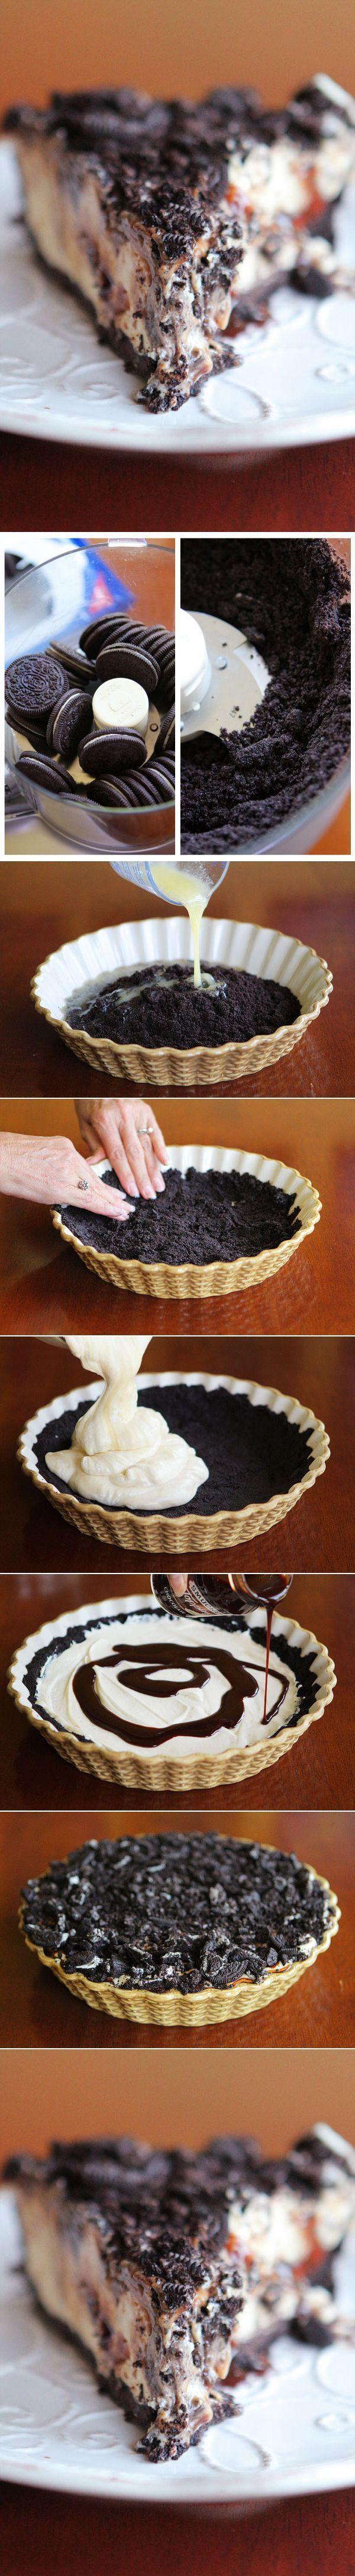 Peanut Butter Oreo Ice Cream Pie